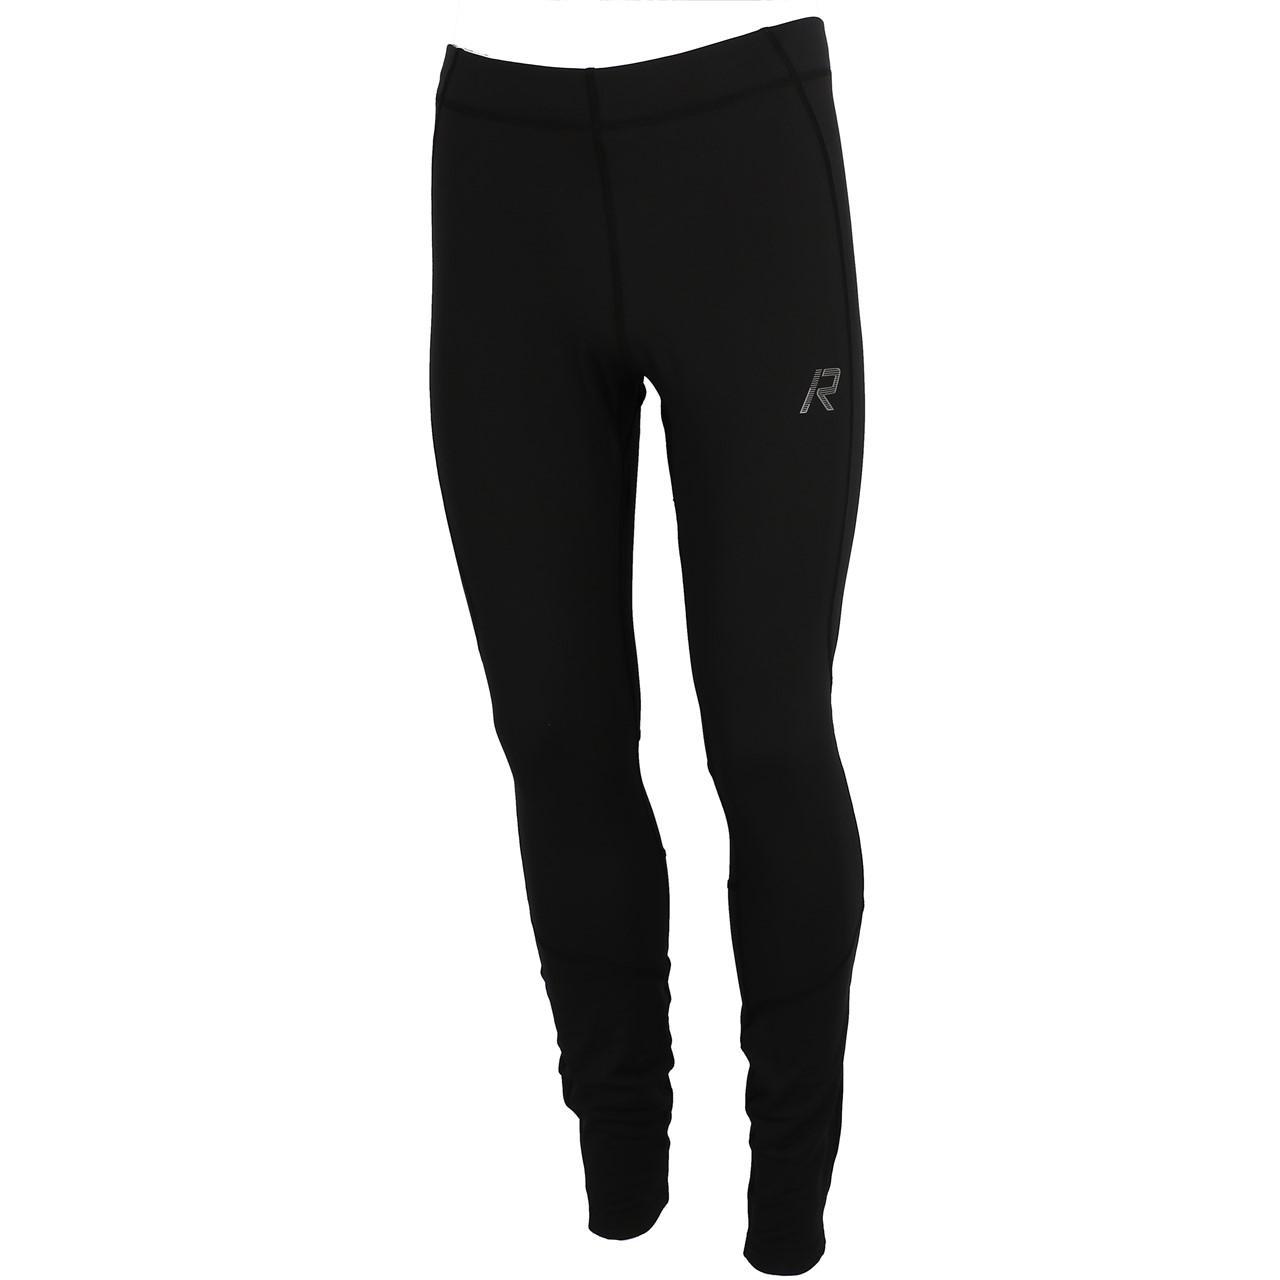 Legging-Sport-Rukka-Jonah-Blk-Tight-Run-Schwarz-25715-Neu